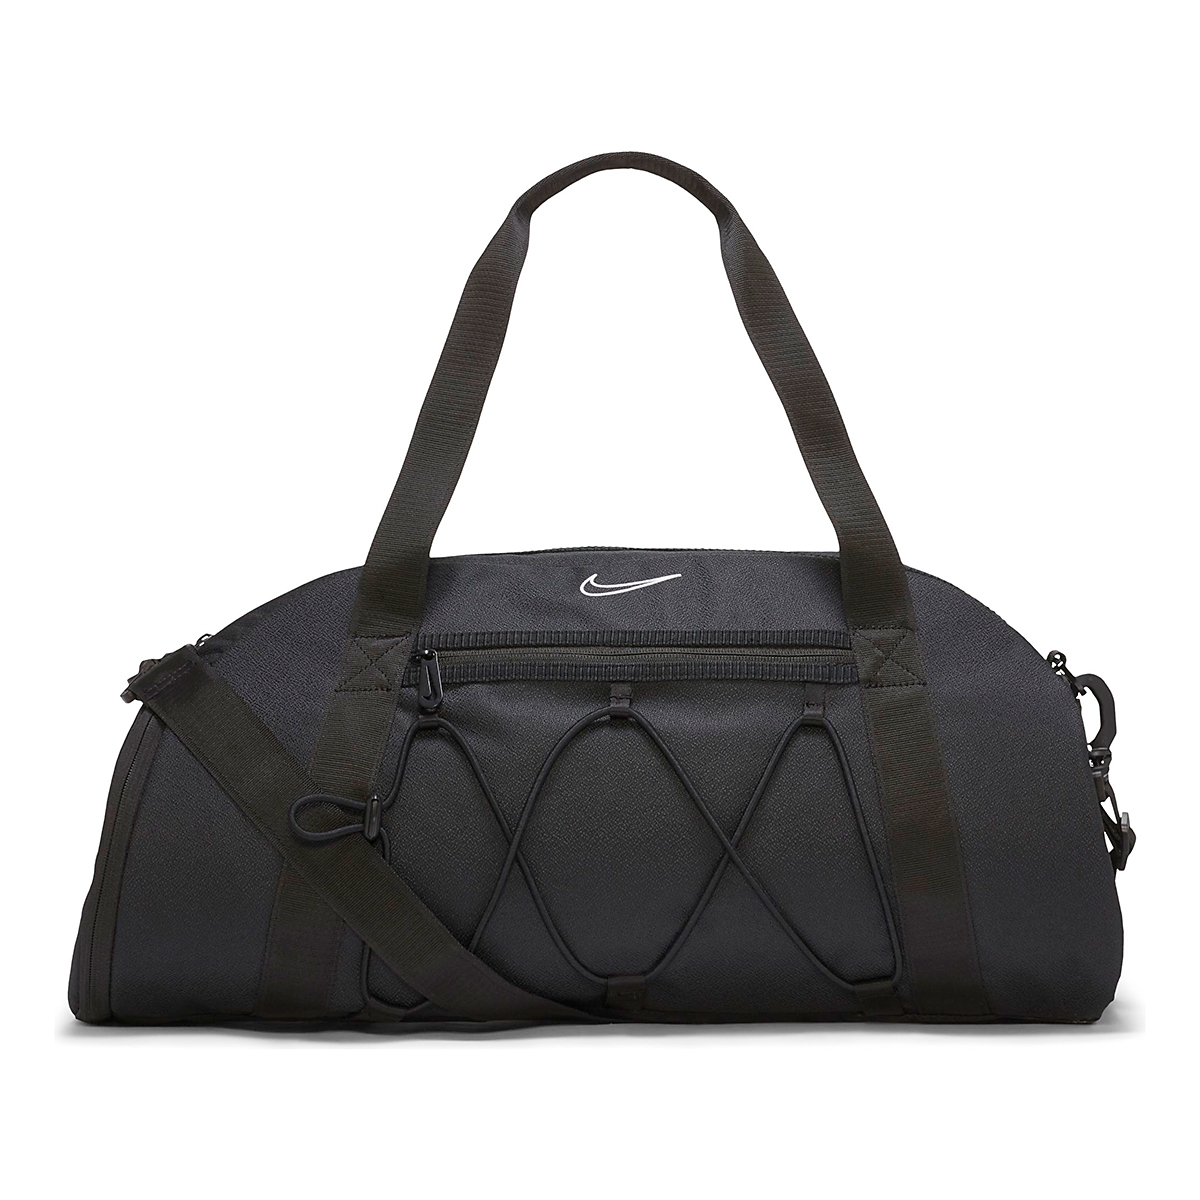 Women's Nike One Club Duffel Bag - Color: Black, Black, large, image 1